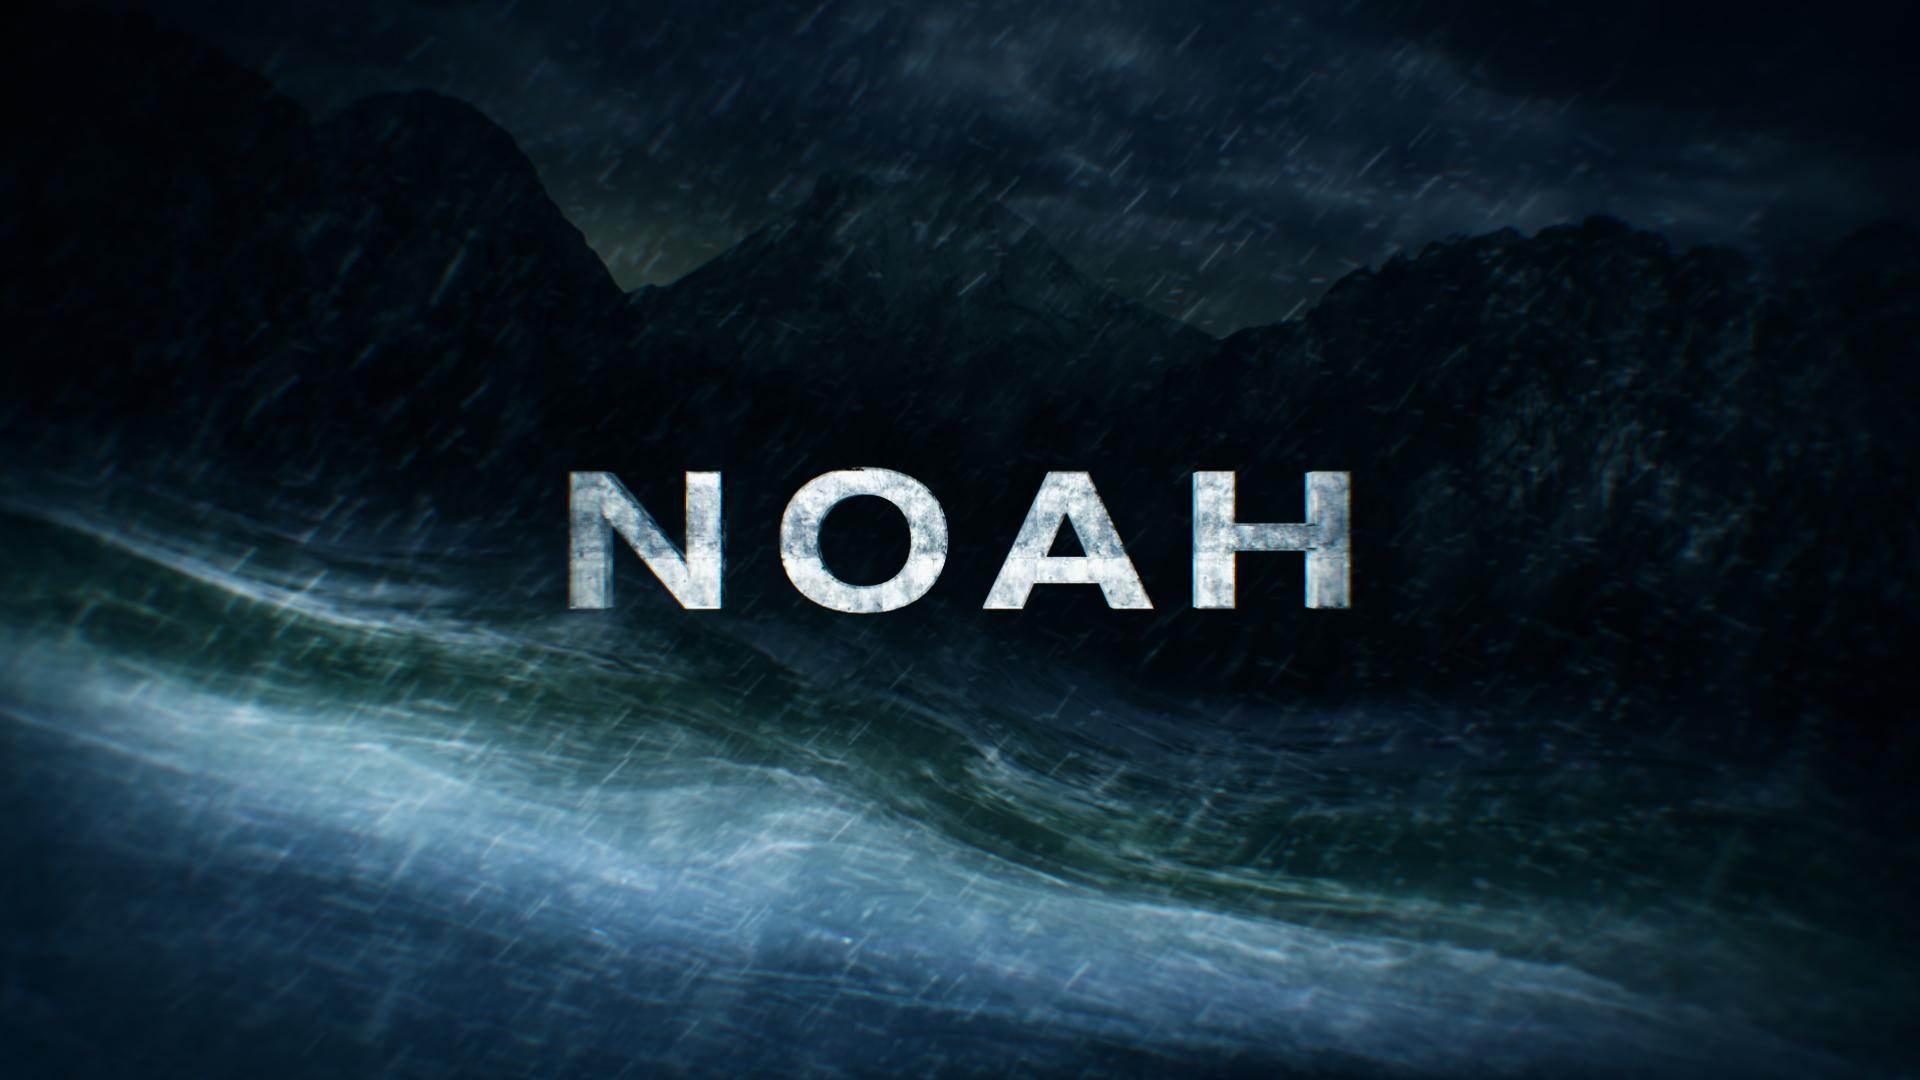 Noah_Title_01_03_03.jpg